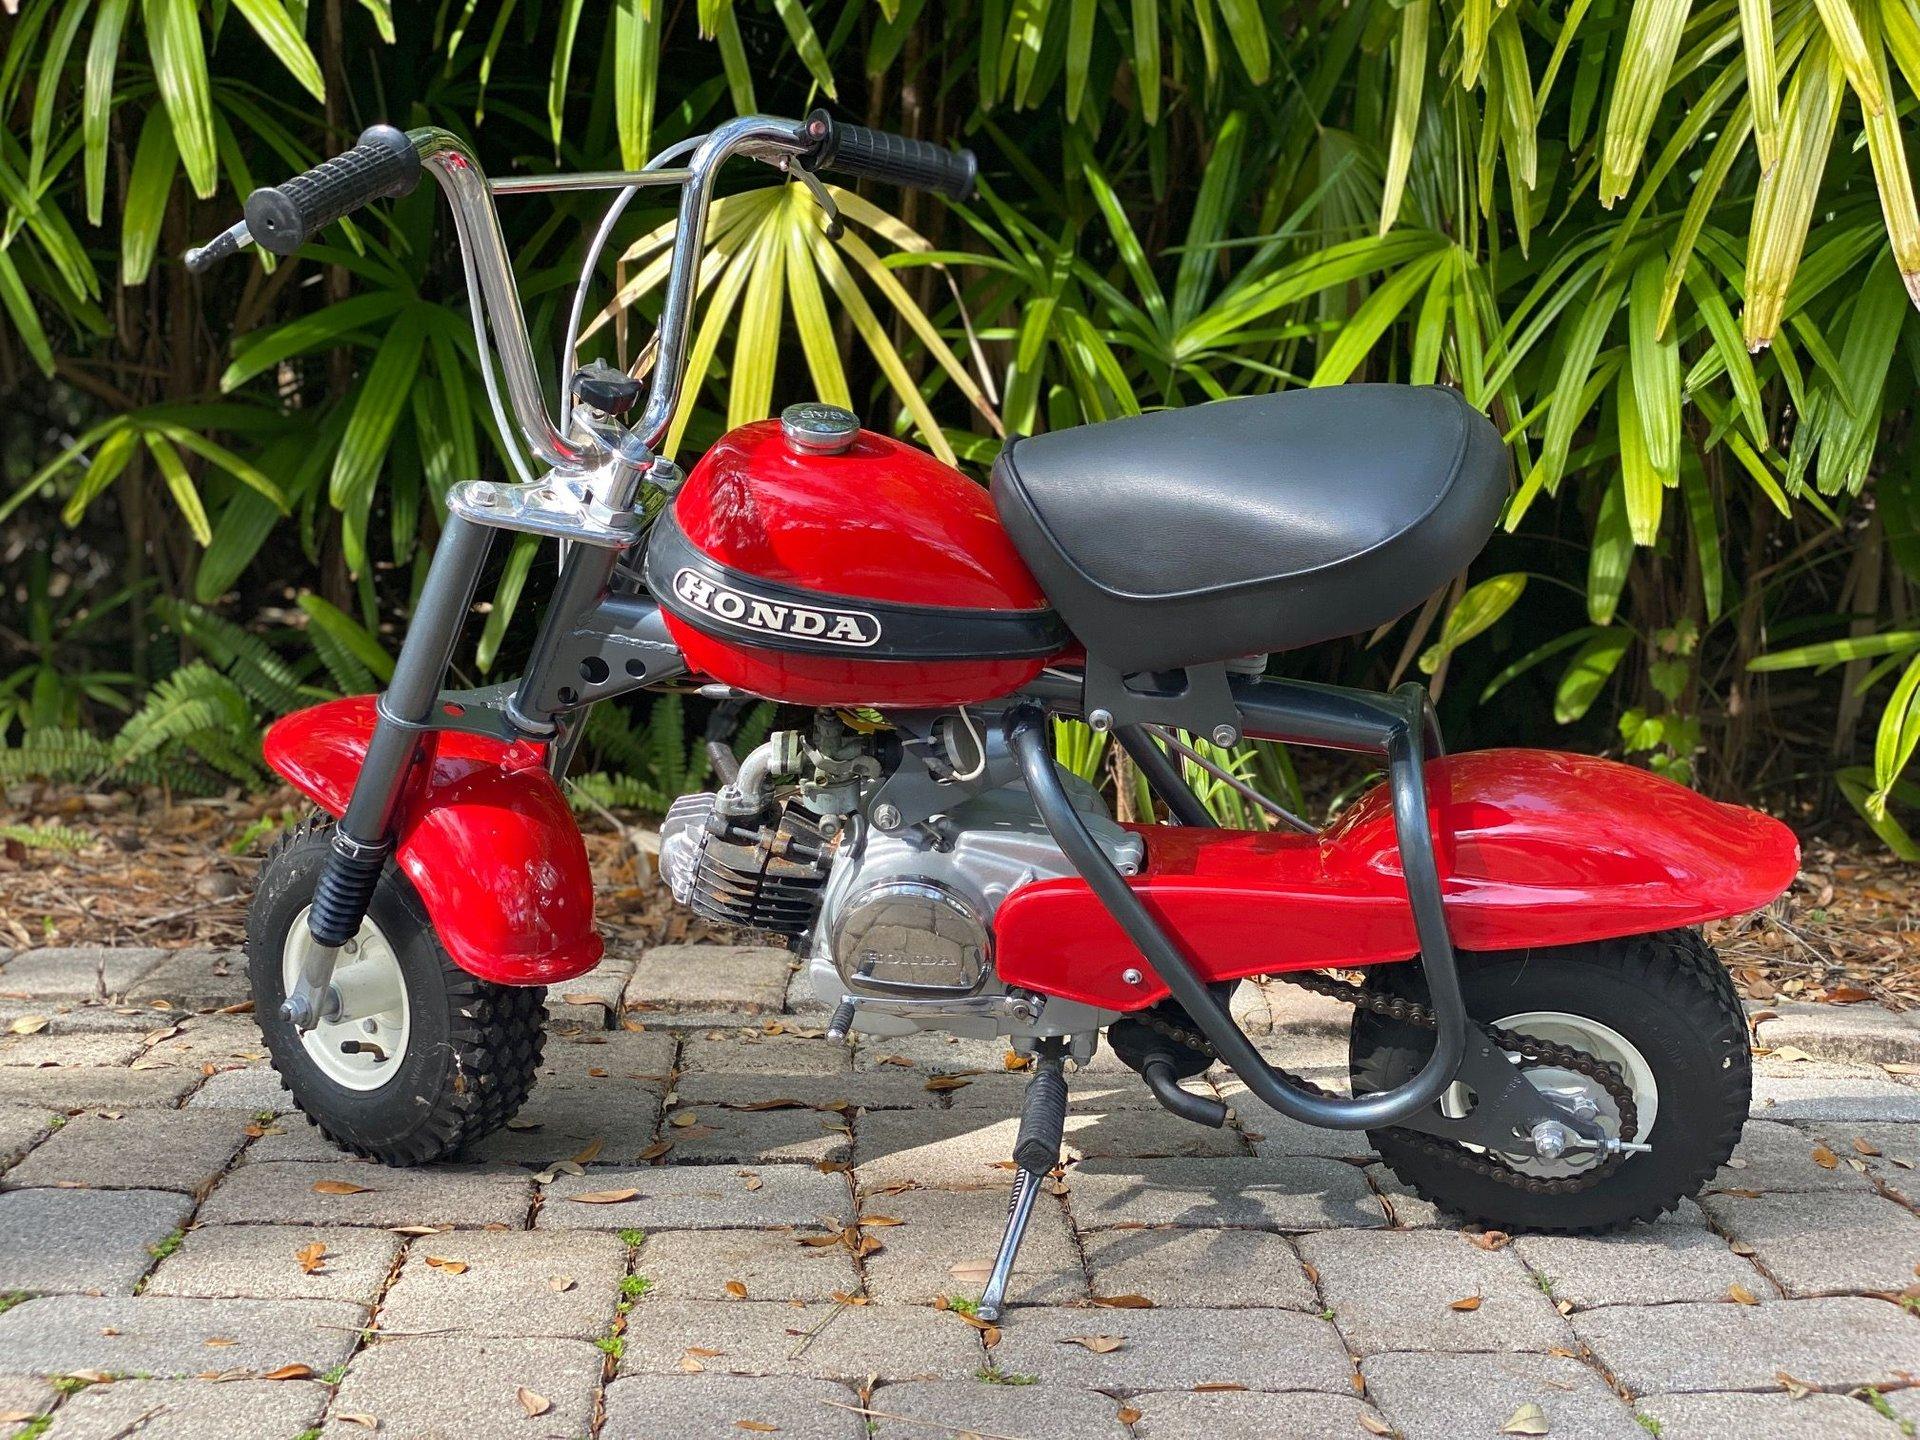 1970 honda qa50 minibike